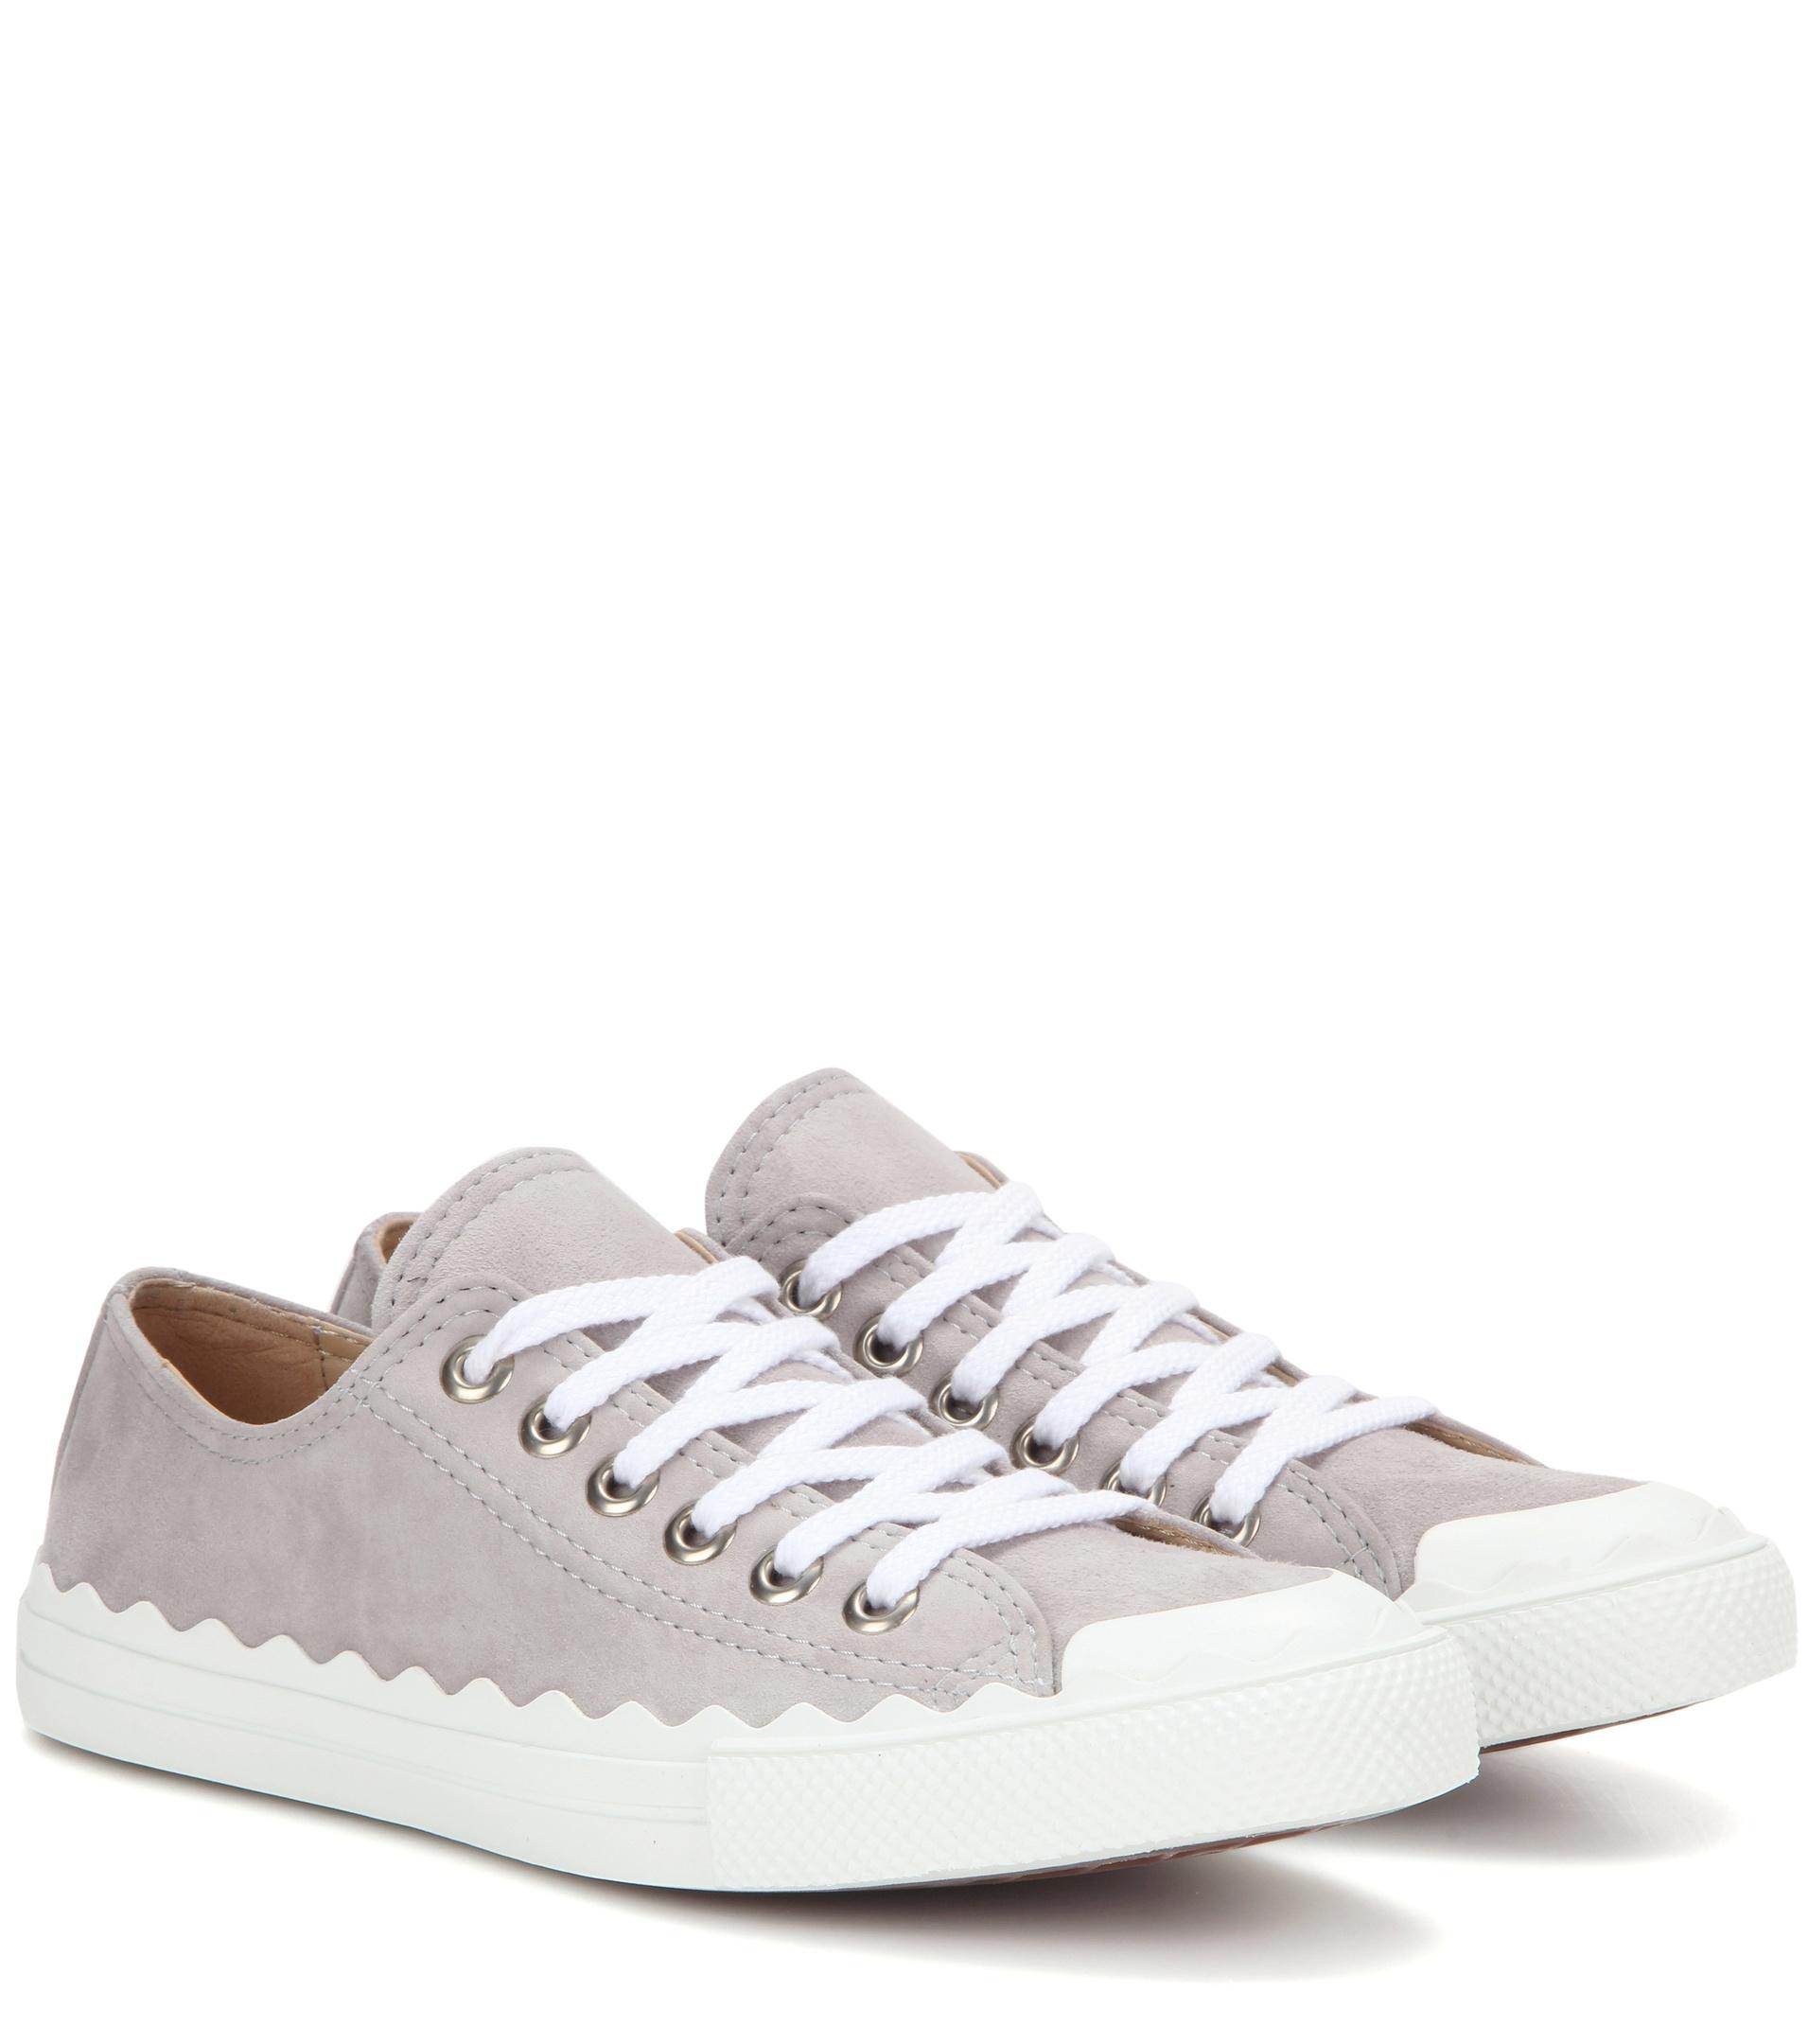 Chlo 233 Lauren Suede Sneakers In White Lyst